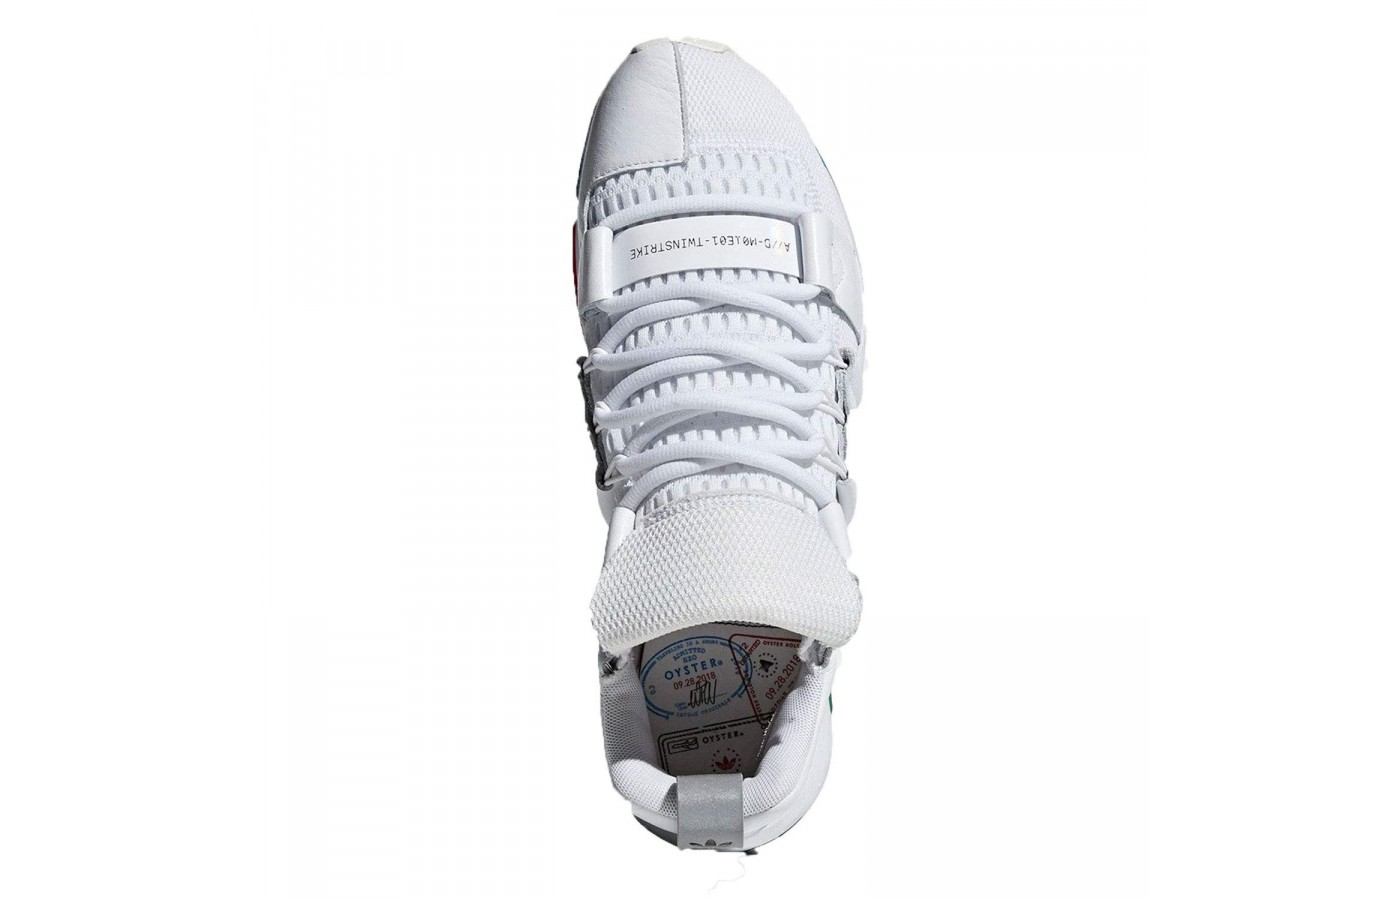 Adidas Twinstrike ADV Top